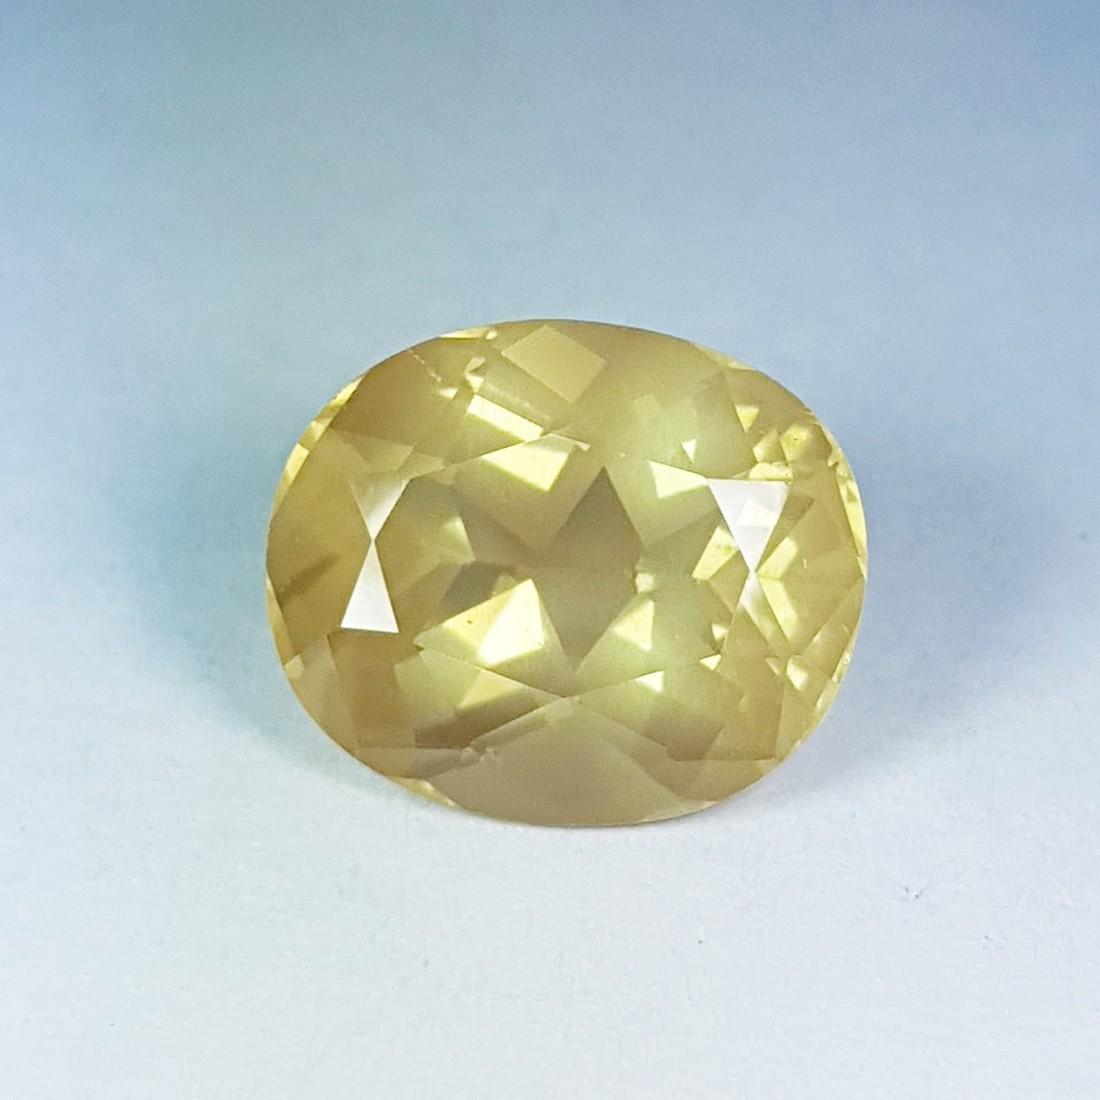 Andesine/Sun Stone - 8.00 ct - 2